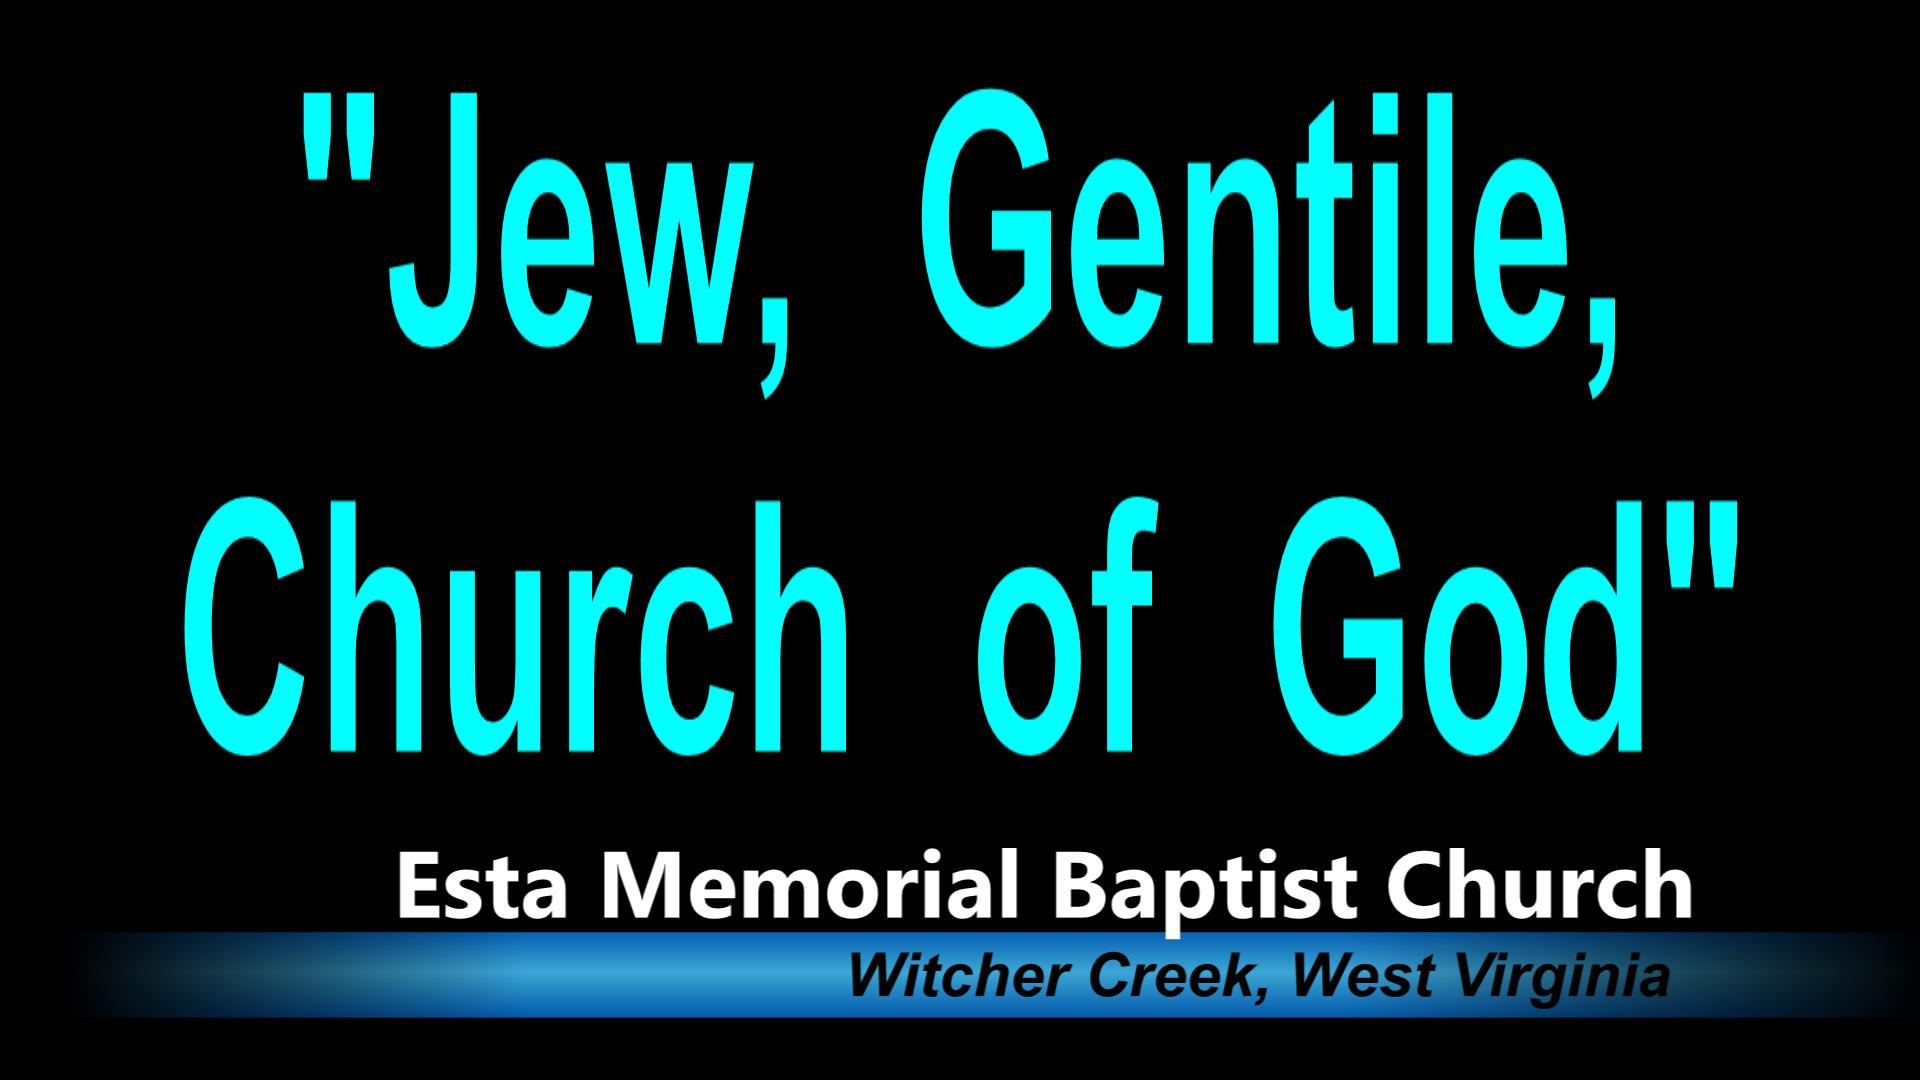 Jew, Gentile, Church of God